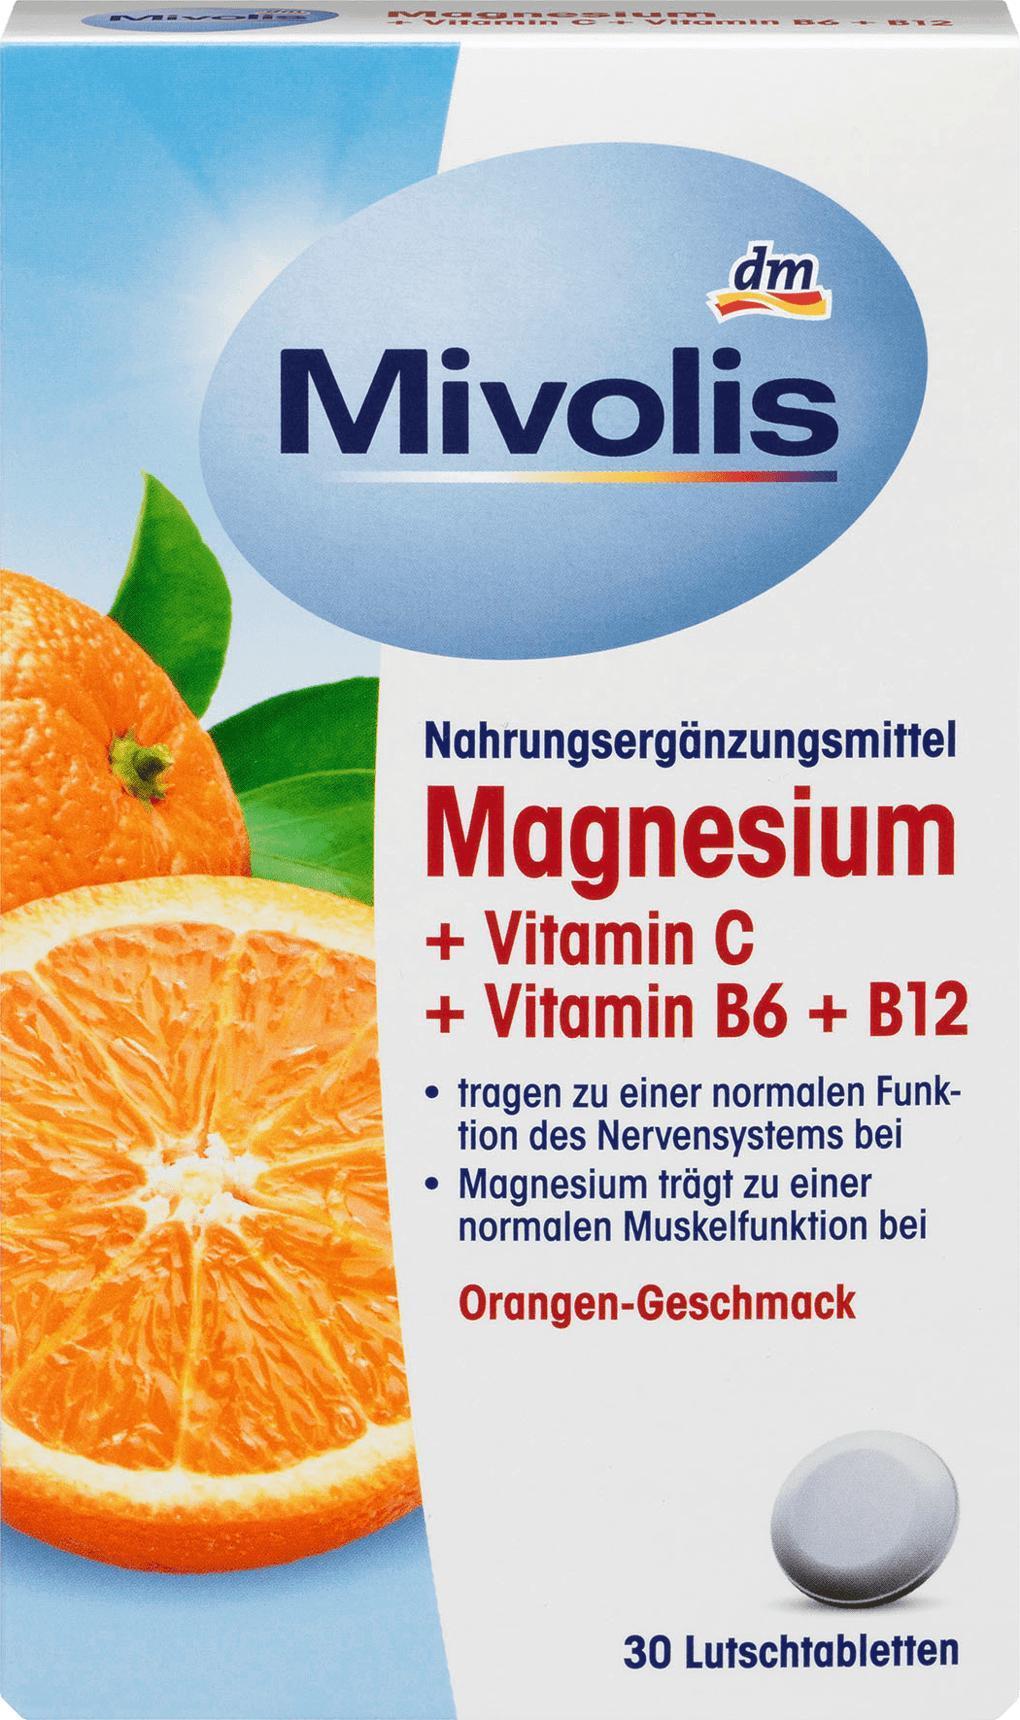 Отзыв на Magnesium + Vitamin C + Vitamin B6 + B12 из Интернет-Магазина DM